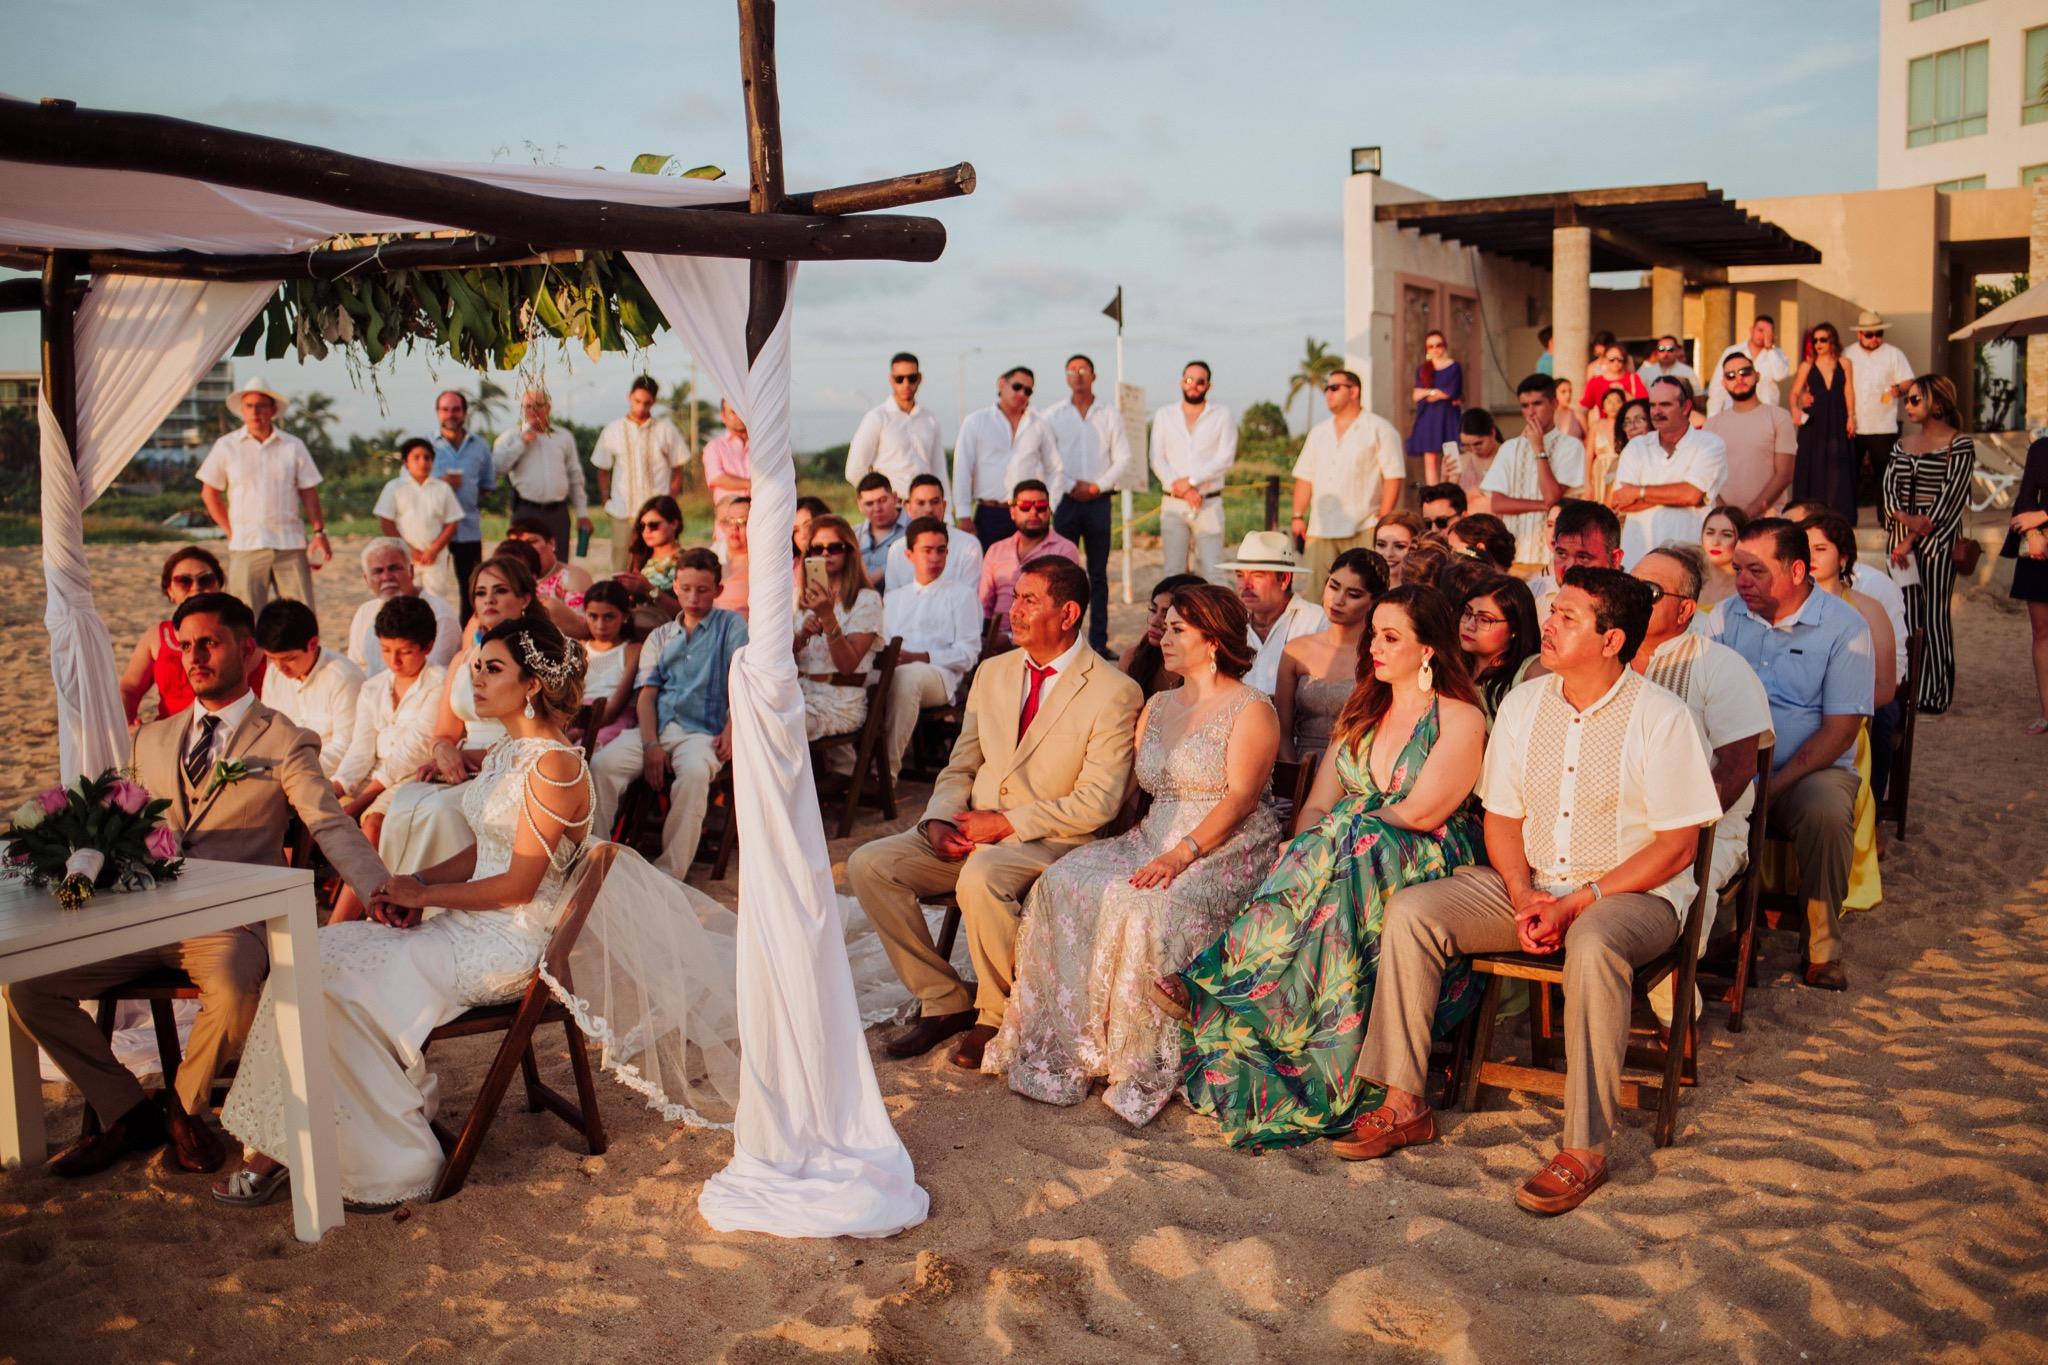 Javier_noriega_fotografo_bodas_profesional_zacatecas_mexico_mazatlan_sinaloa_photographer_weddings58